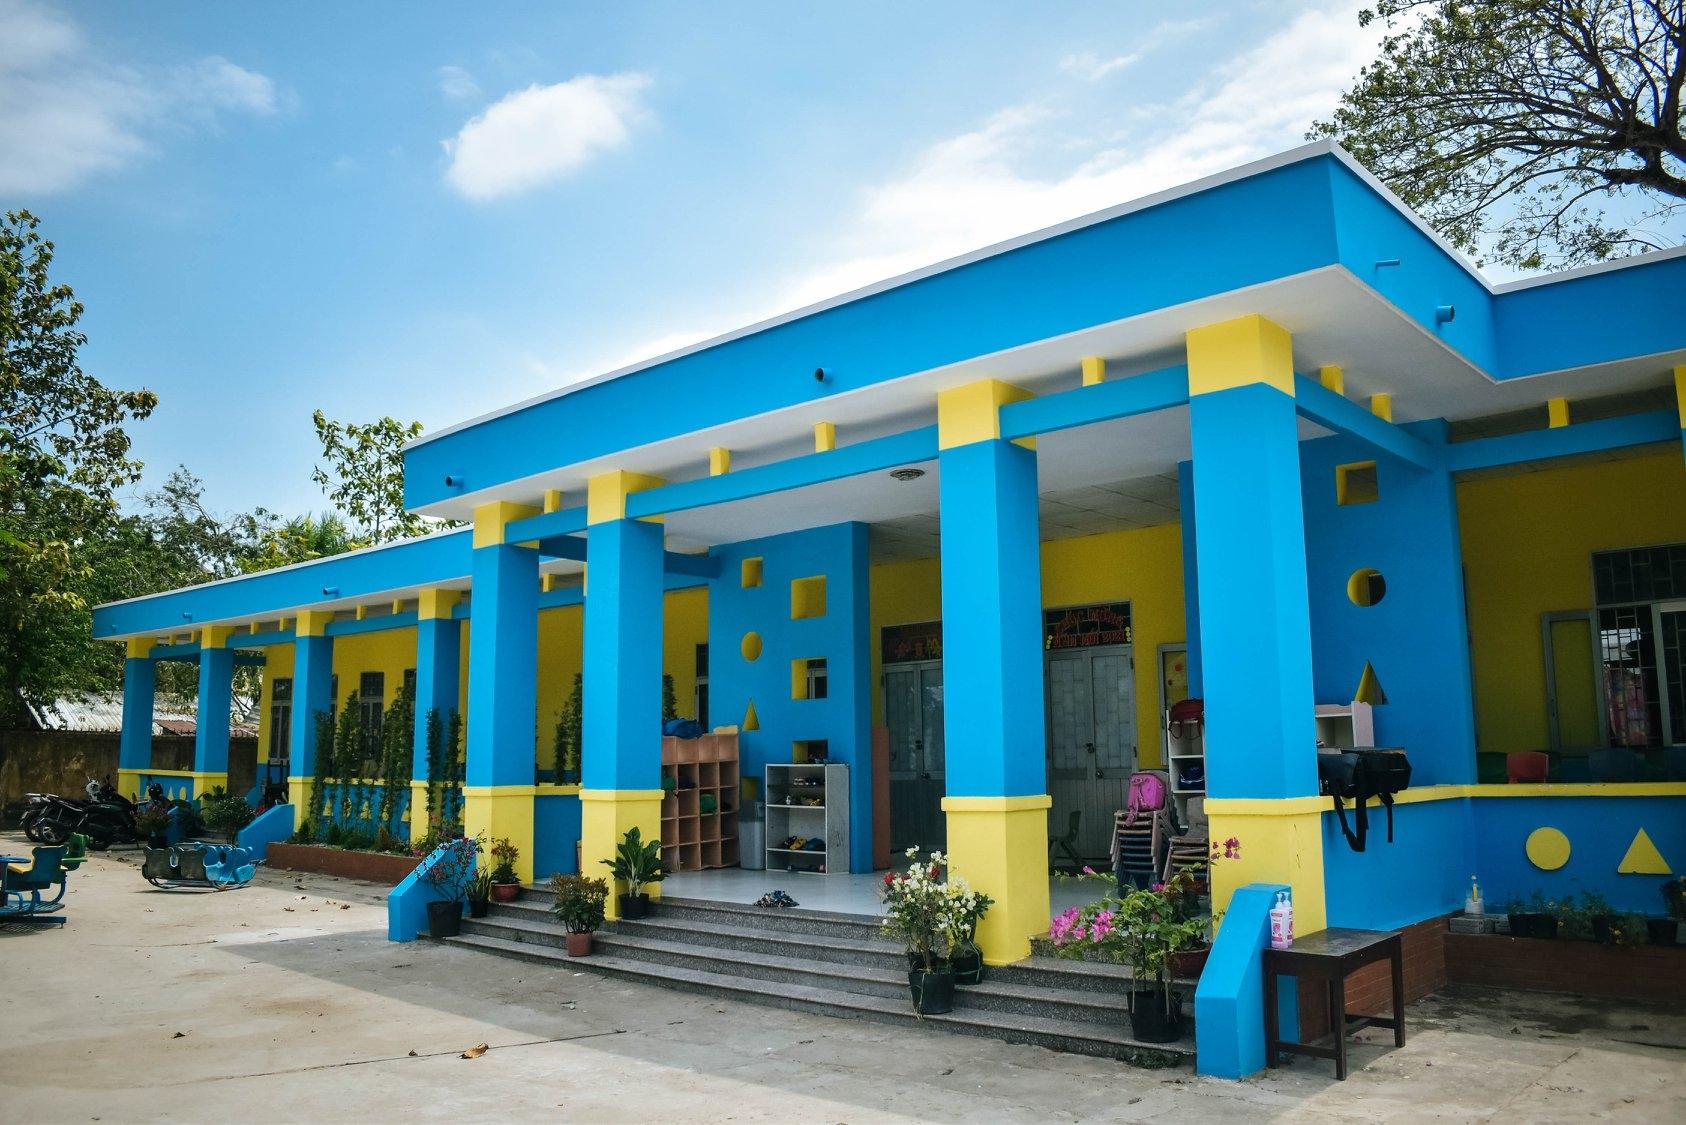 Another kindergarten built by Saigonchildren in Hau Giang